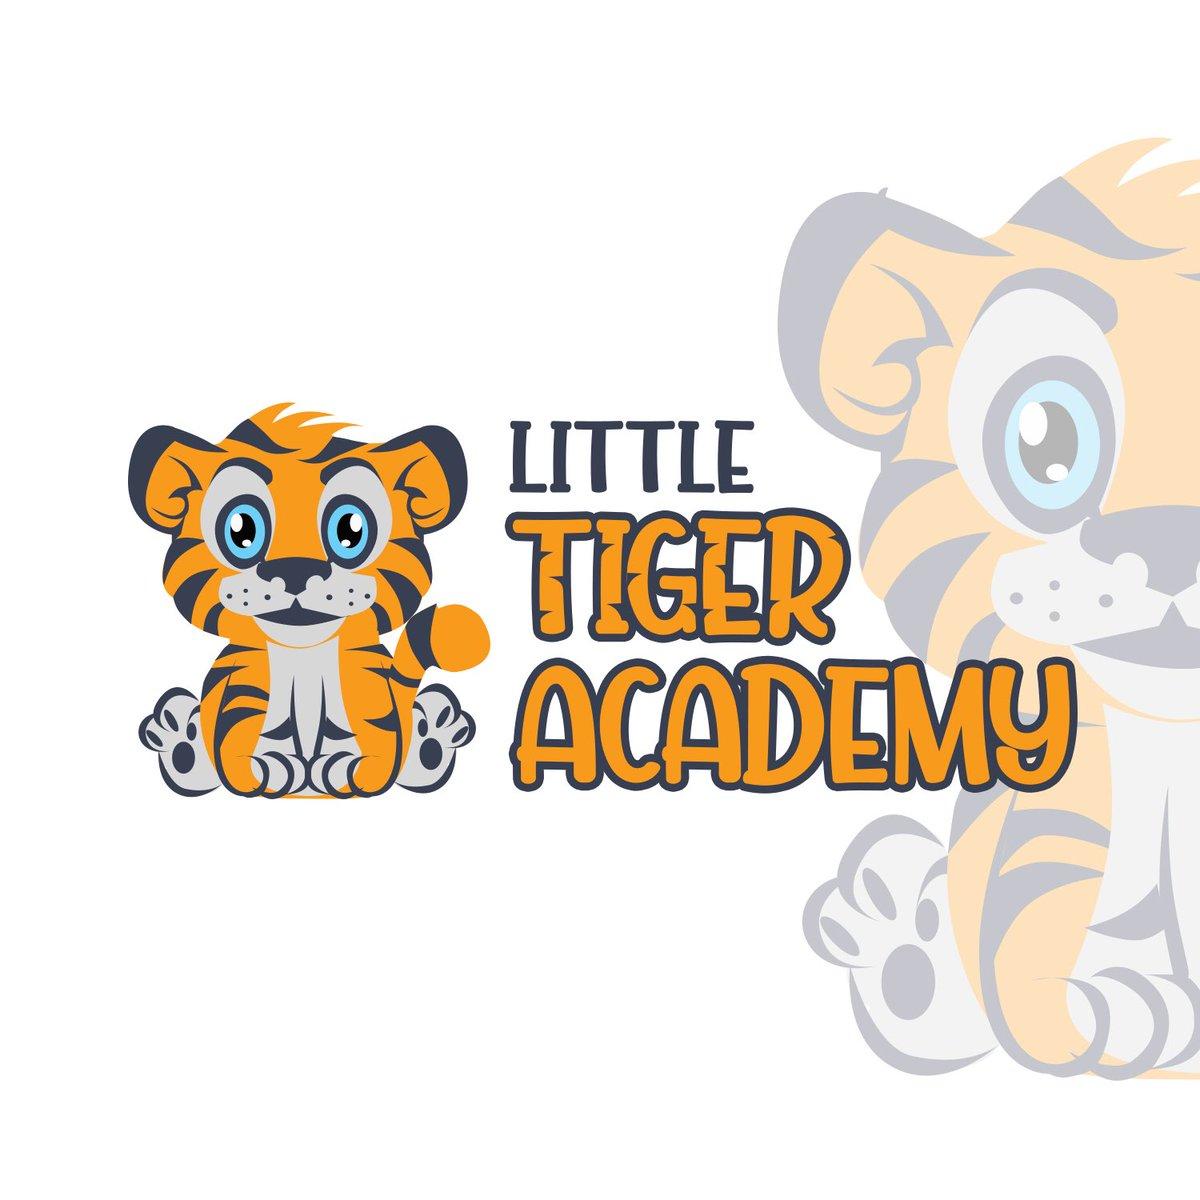 Illustration logo for Little tiger Academy. #LogoDesign #logoservice